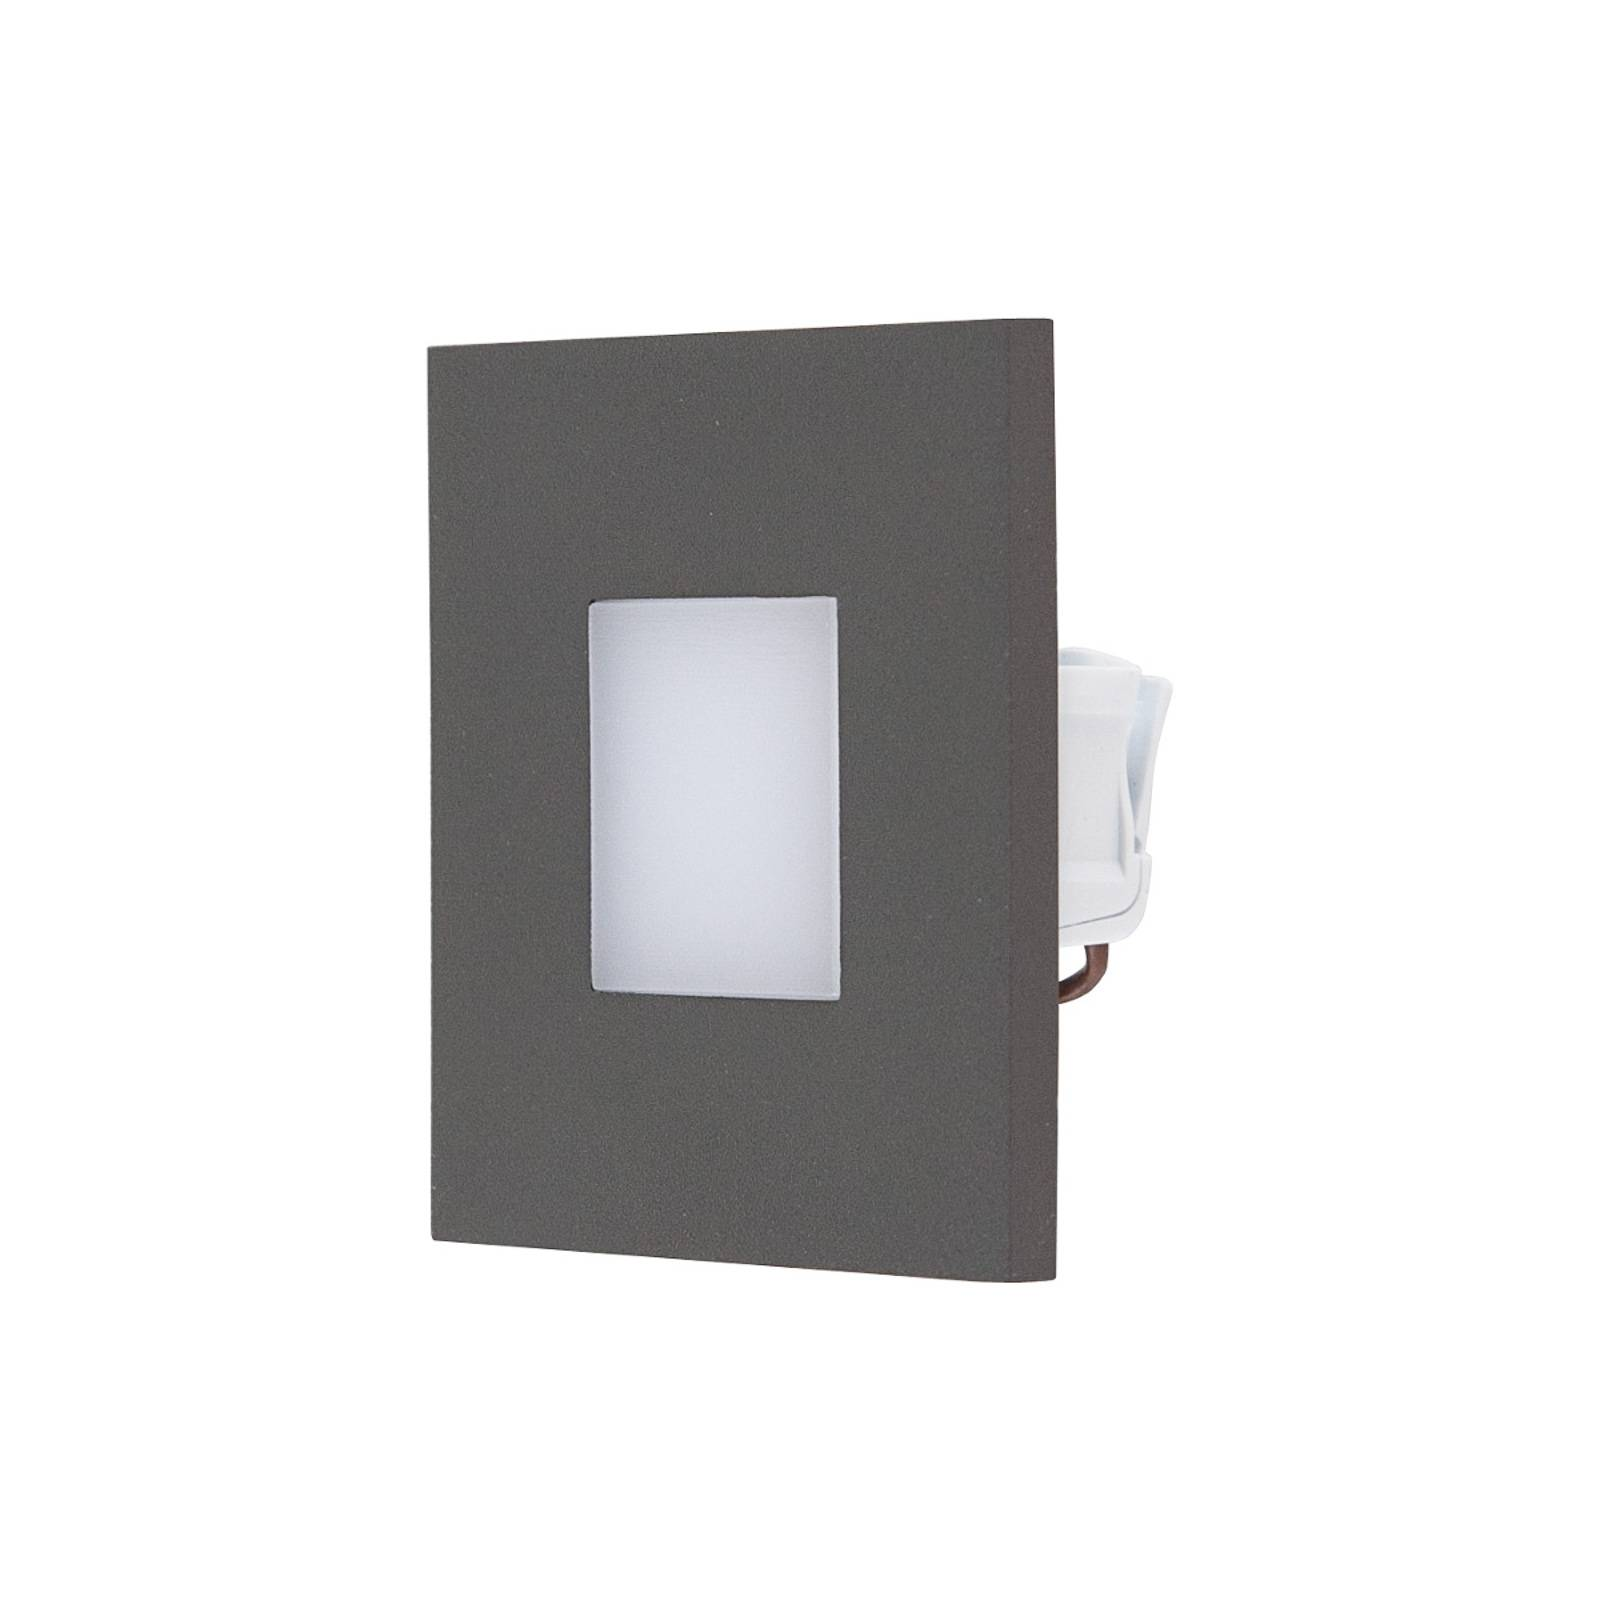 EVN LQ230 applique LED encastrable direct anthr